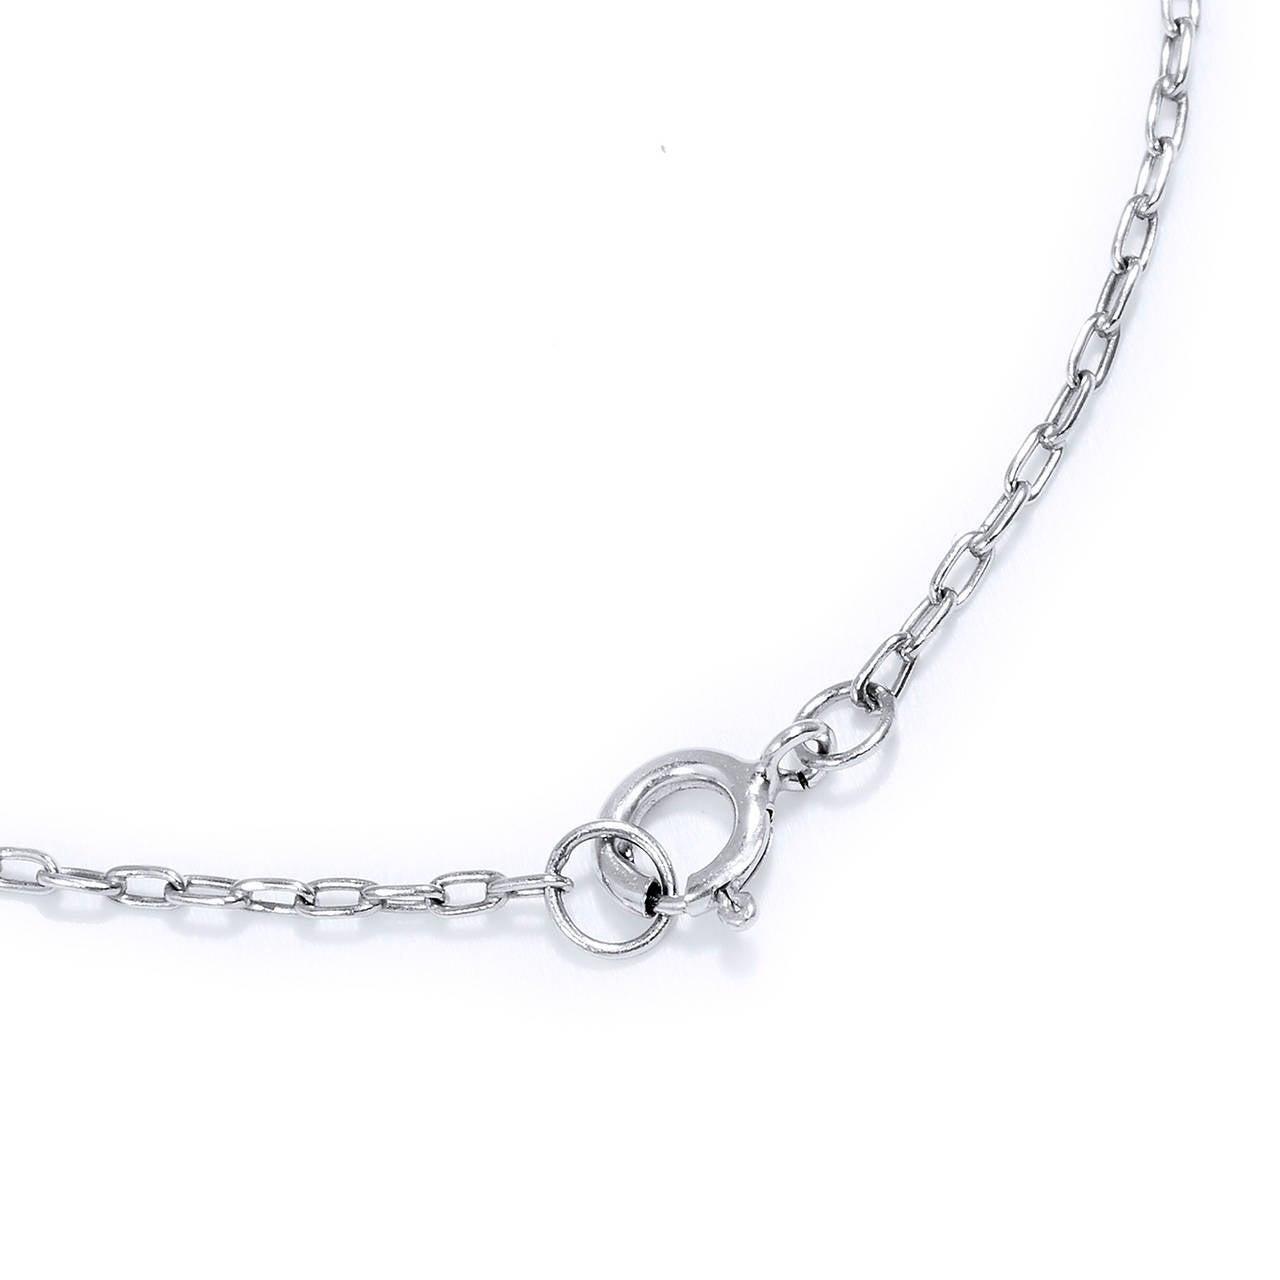 Women's A.G.L. Certified 9.83 Carat Pear Shaped Sapphire & 3 ct Diamond Platinum Pendant For Sale